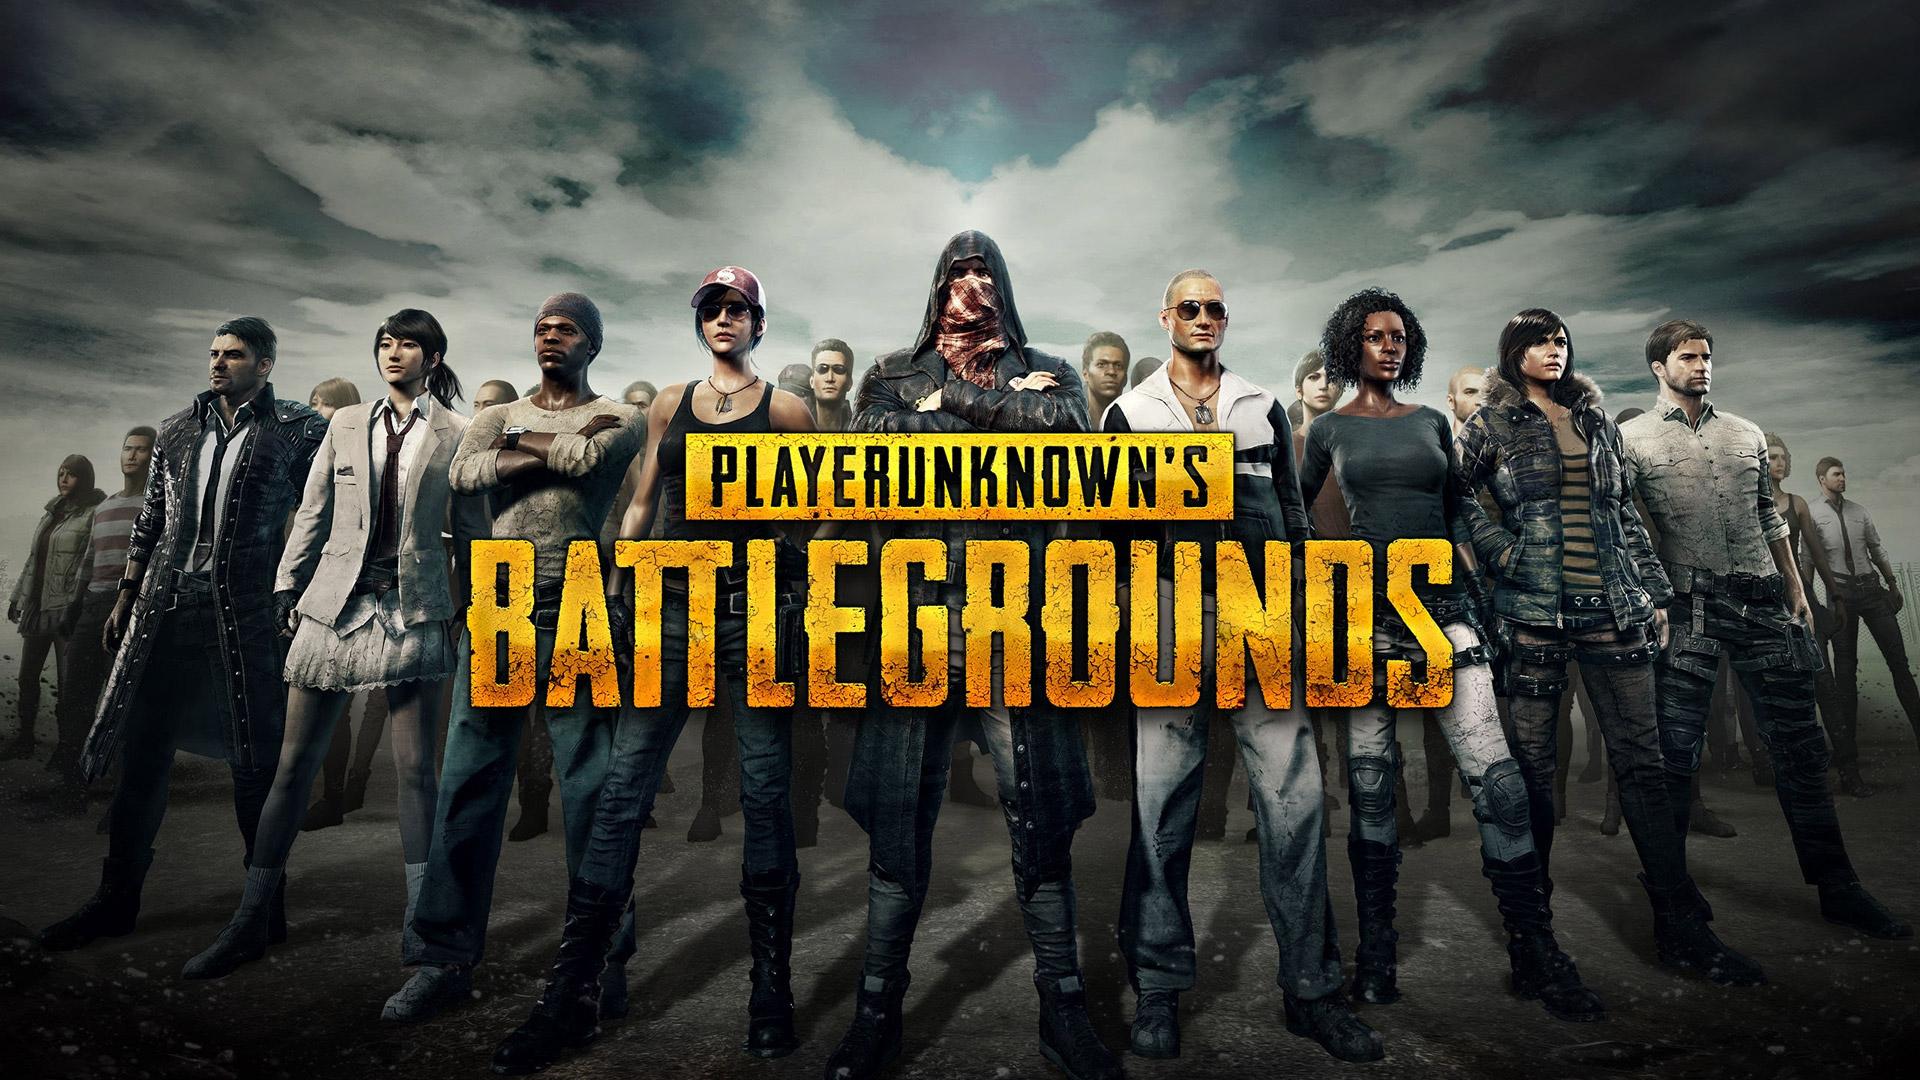 Free PlayerUnknown's Battlegrounds Wallpaper in 1920x1080